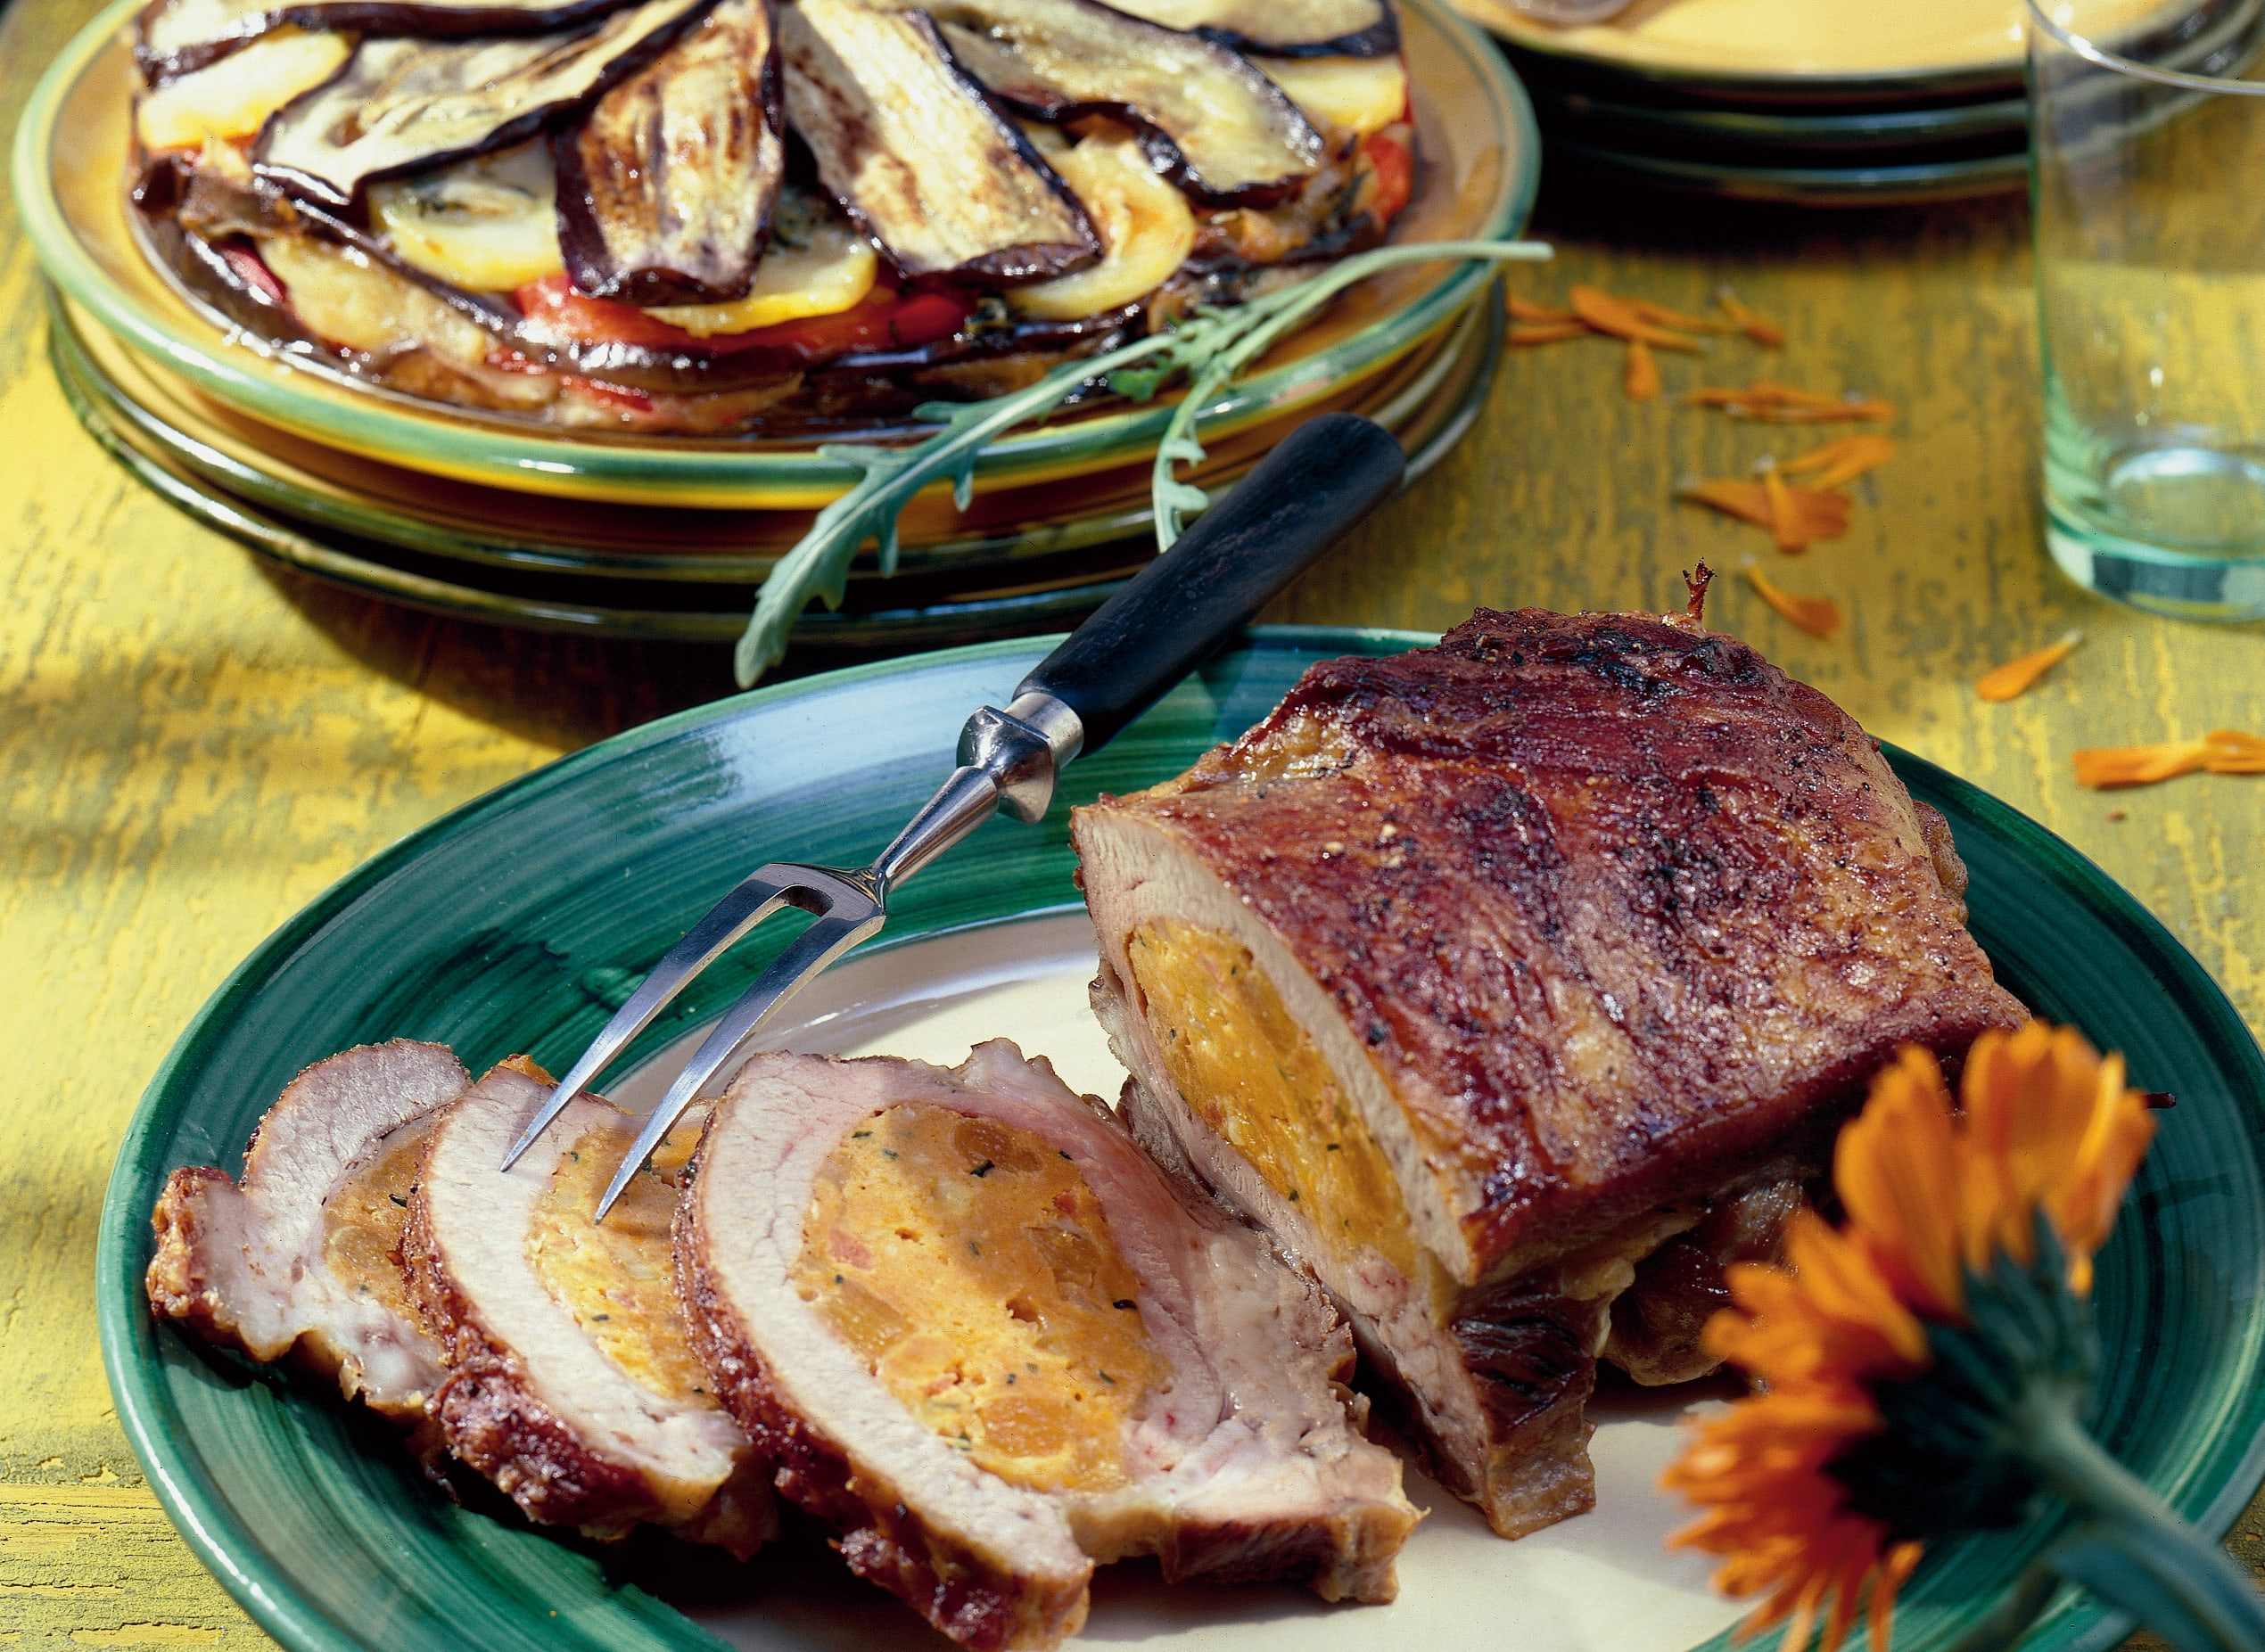 Kalbsbrust mit Aprikosen-Mozzarella-Brät-Füllung